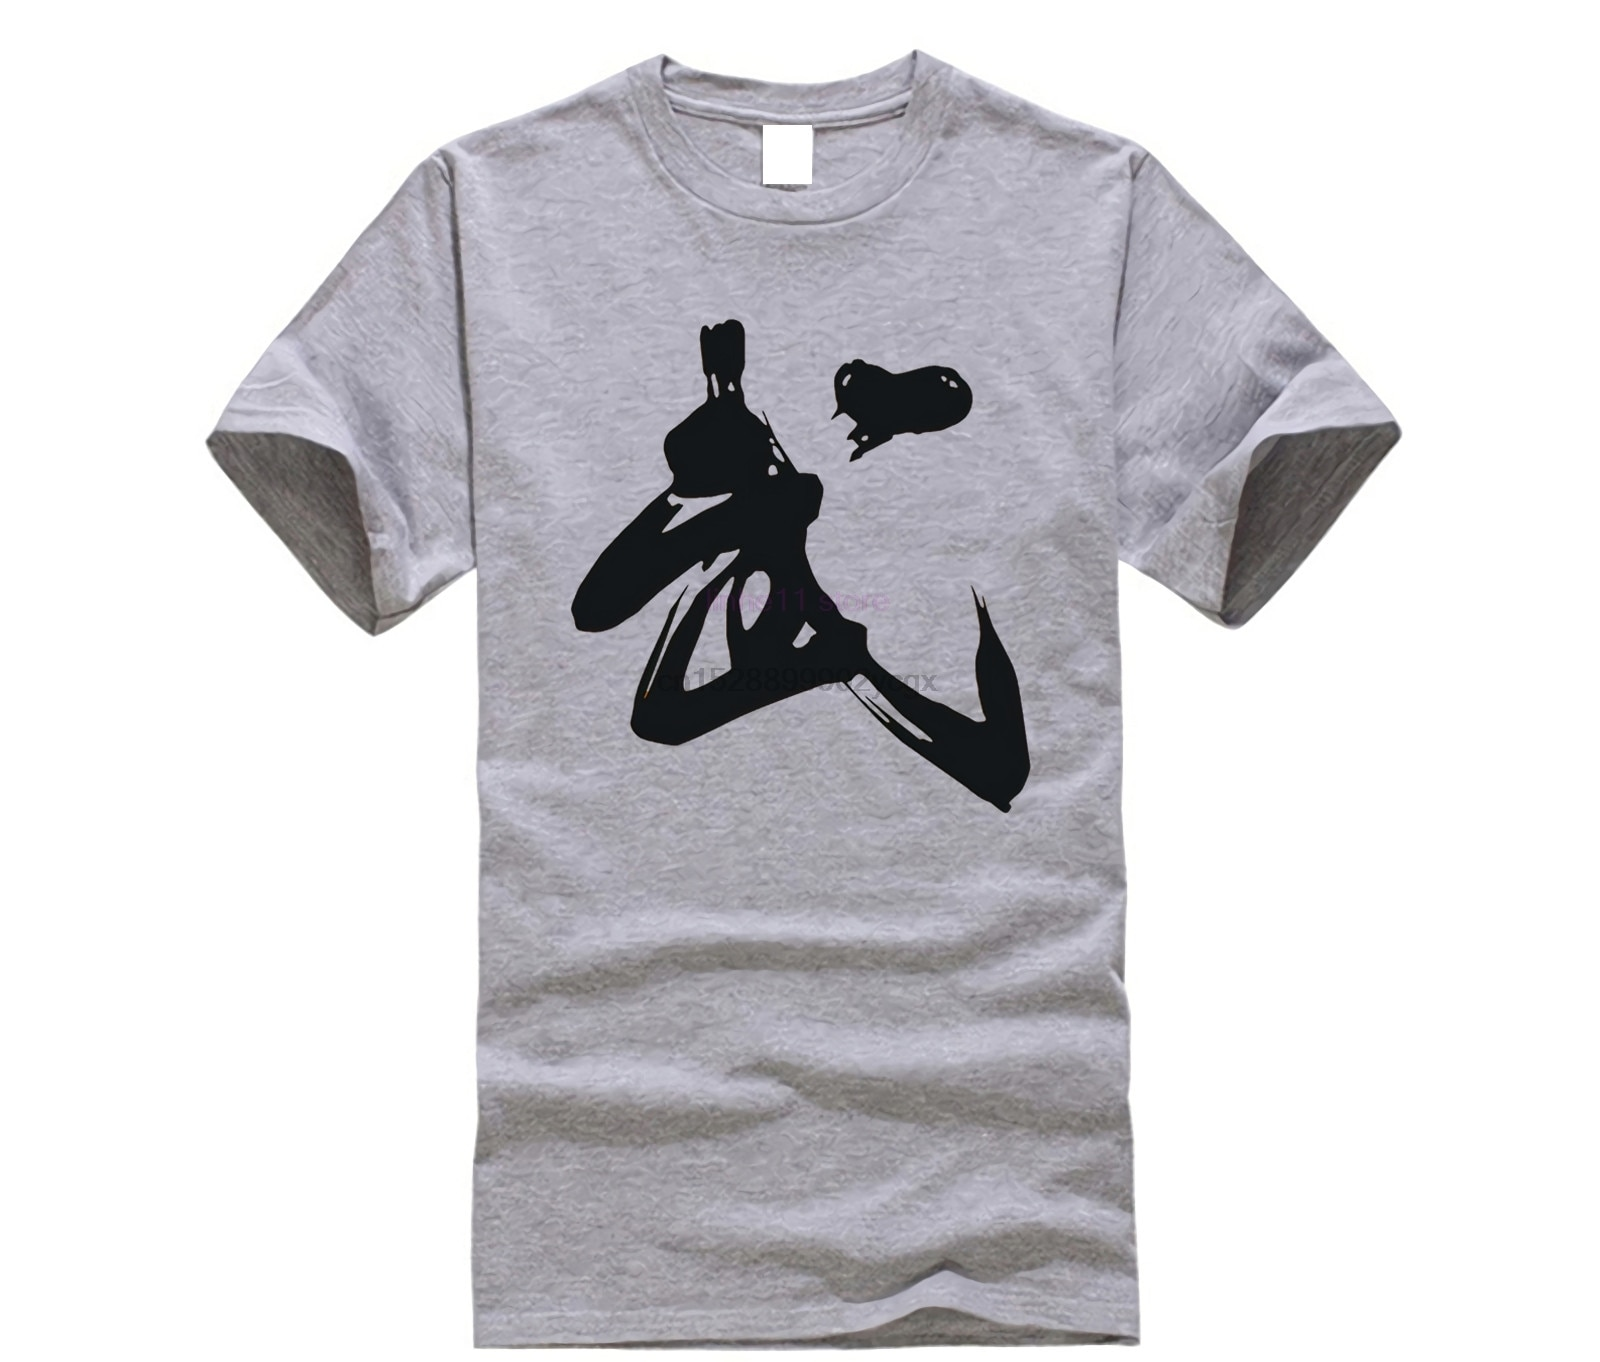 2019 New Chinese Calligraphy Martial Word Men T-shirt China Shaolin Kung Fu Culture Print Tshirt Fashion Street T Shirt 3XL